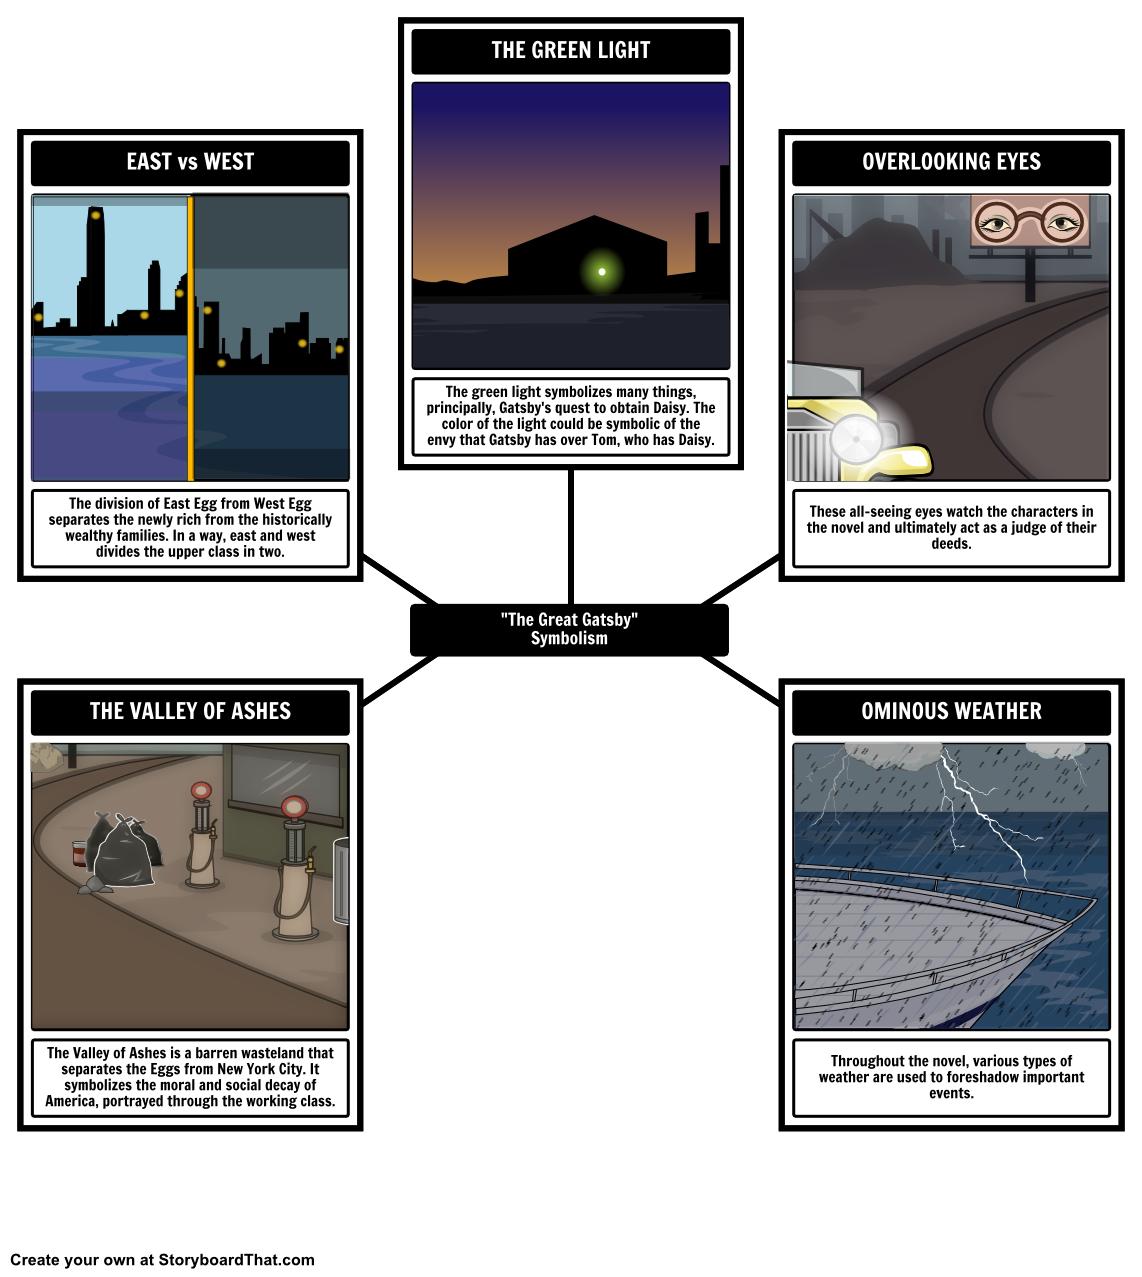 Plot Diagram For The Great Gatsby Compound Microscope Symbolism Analyze Symbols Hidden